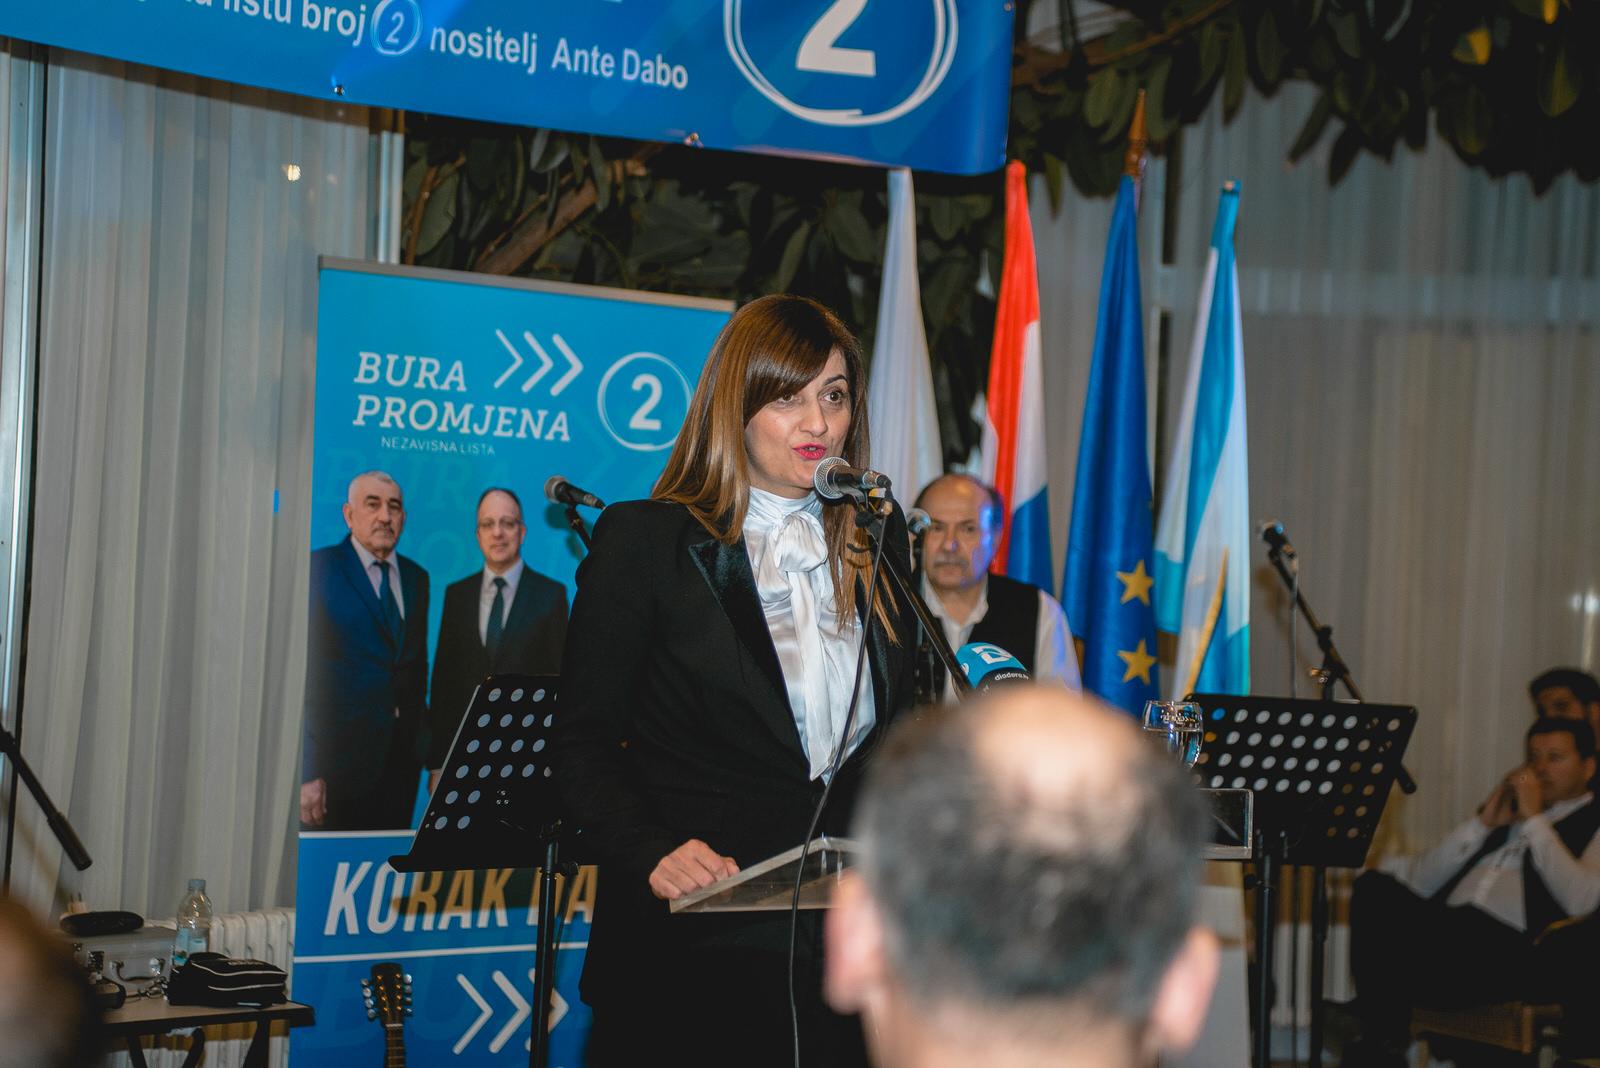 likaclub_bura-promjena_novalja_2019-7